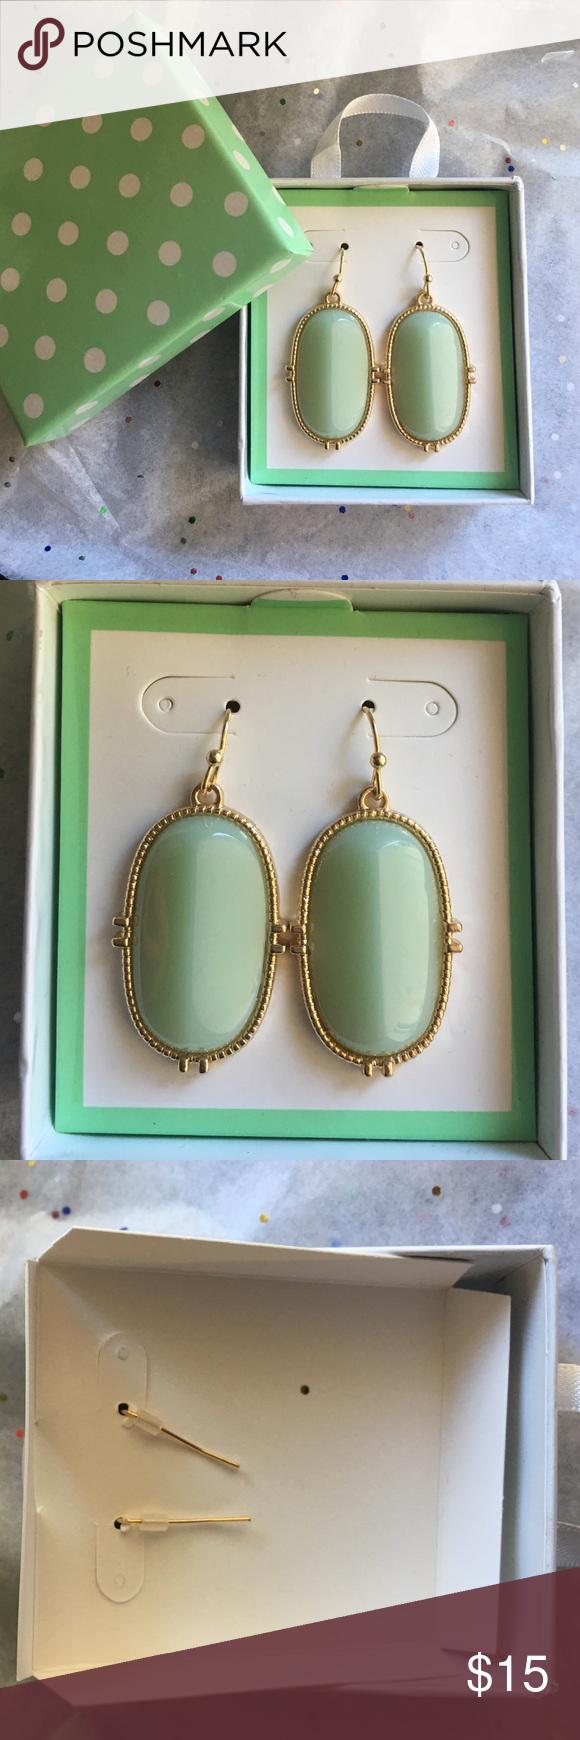 NIP beautiful earrings Brand new in package beautiful green and ...